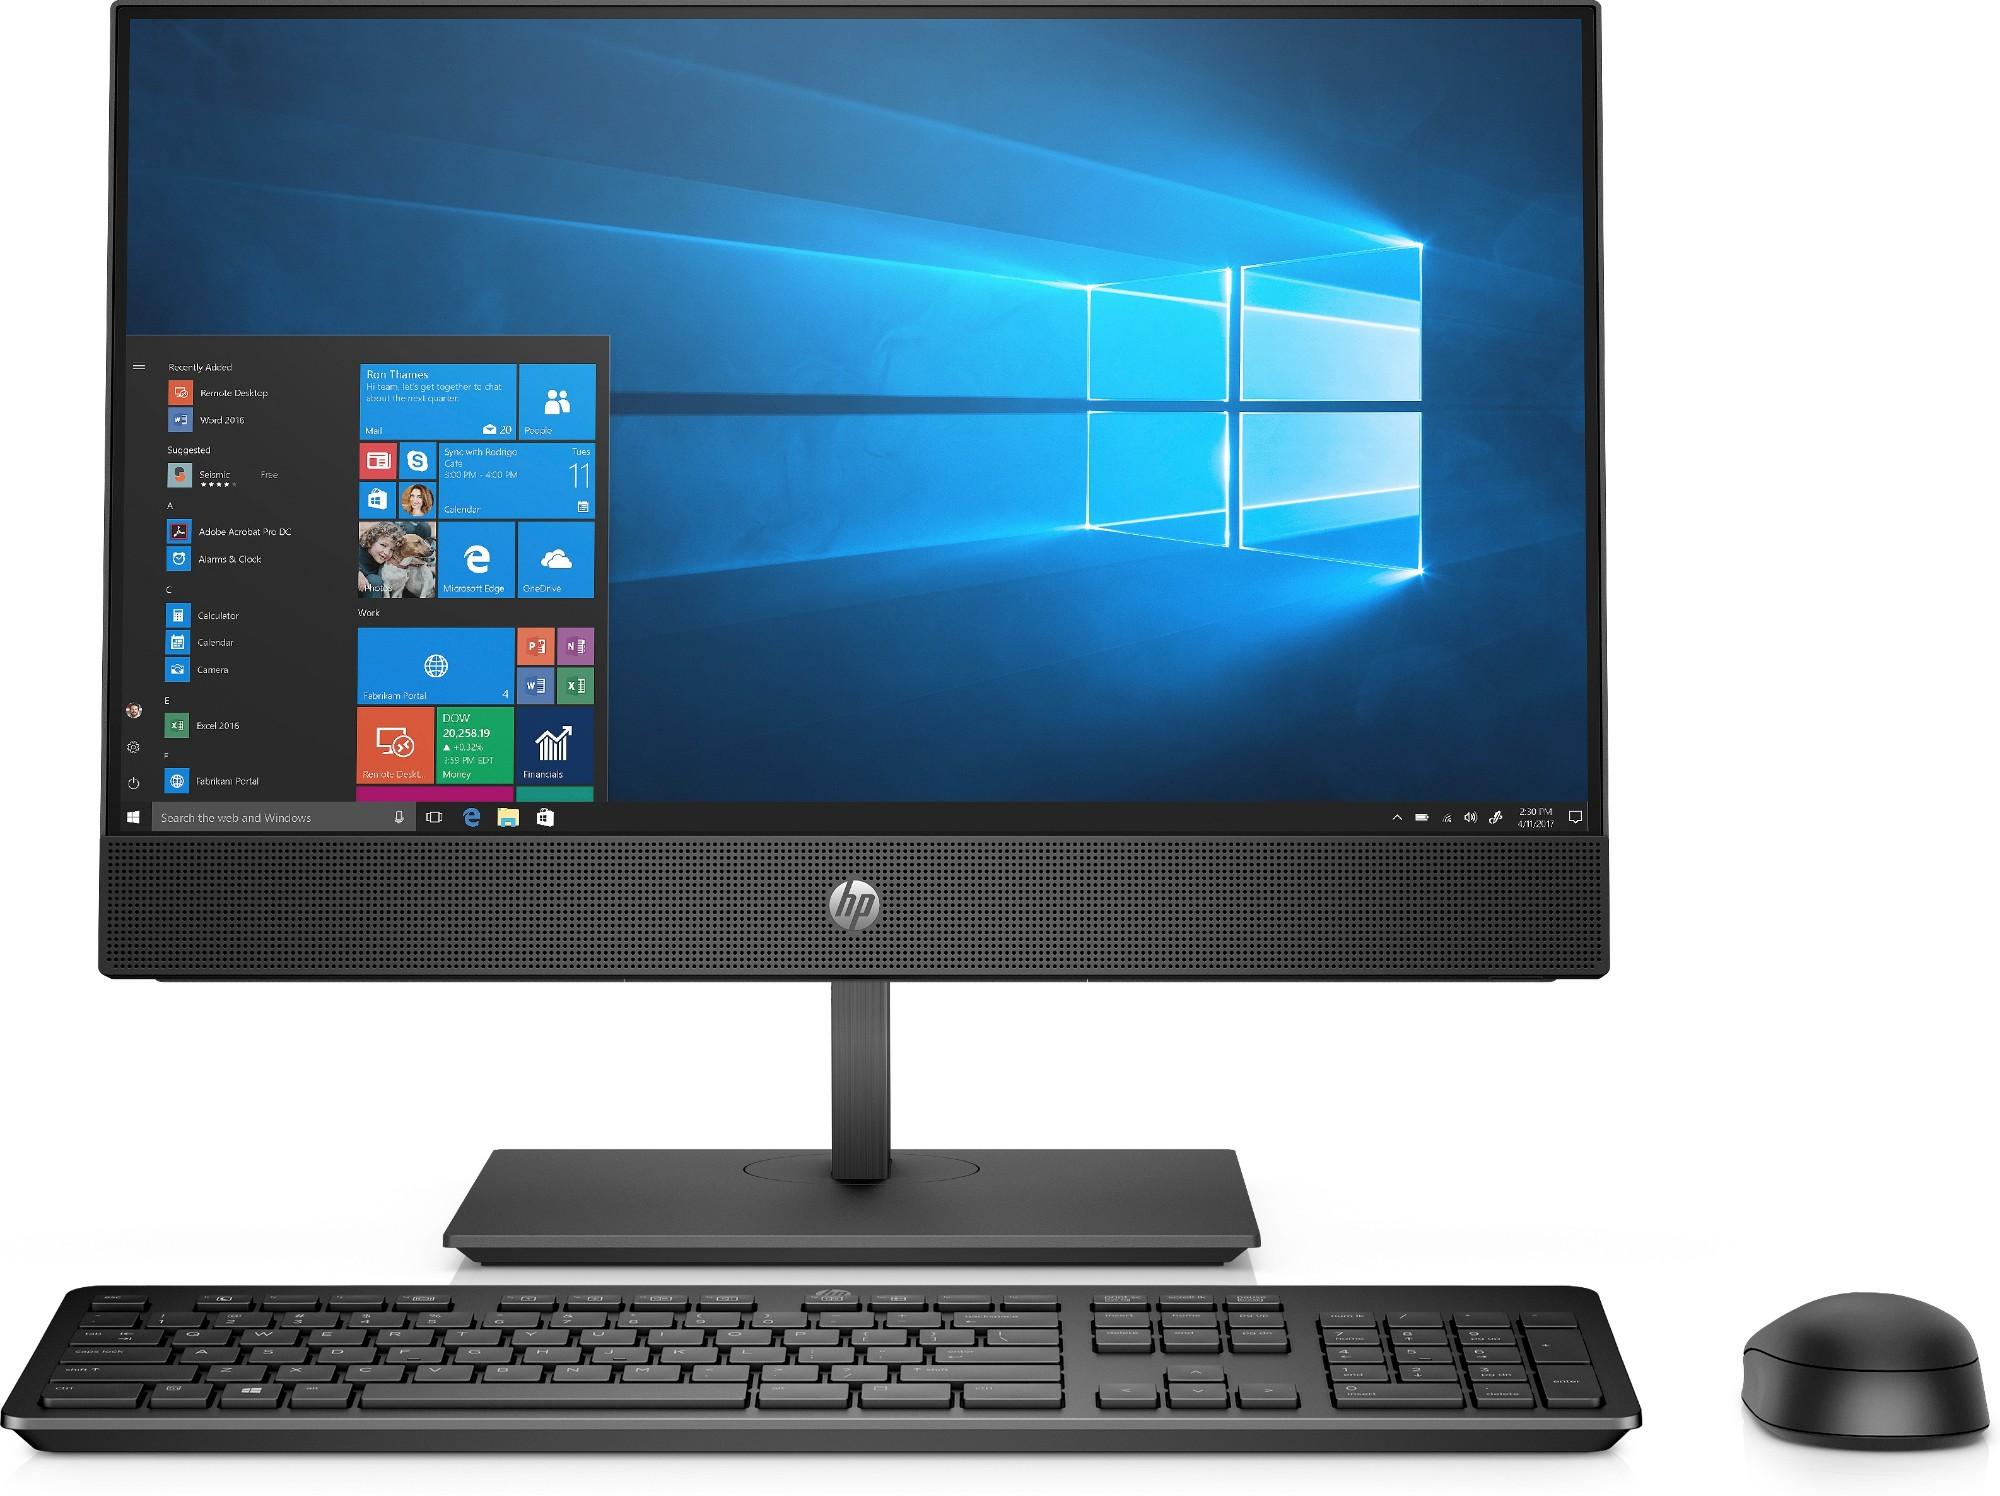 HP ProOne 600 G4 3GHz i5-8500 8th gen Intel® Core™ i5 21.5